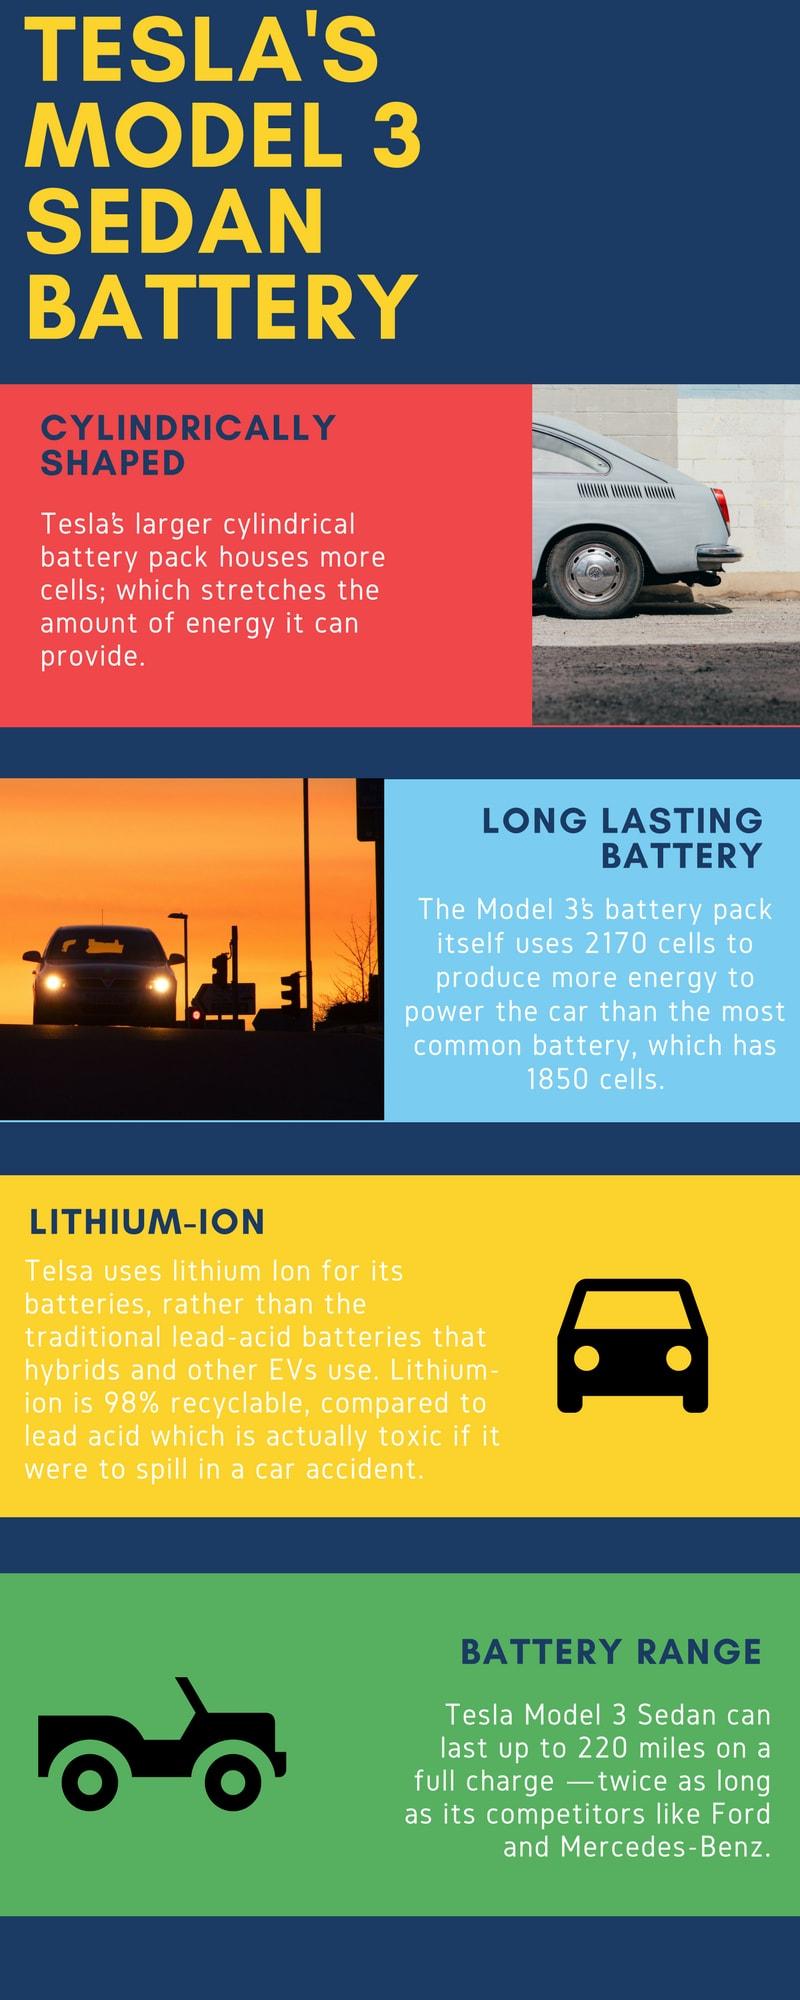 Tesla infographic.jpg